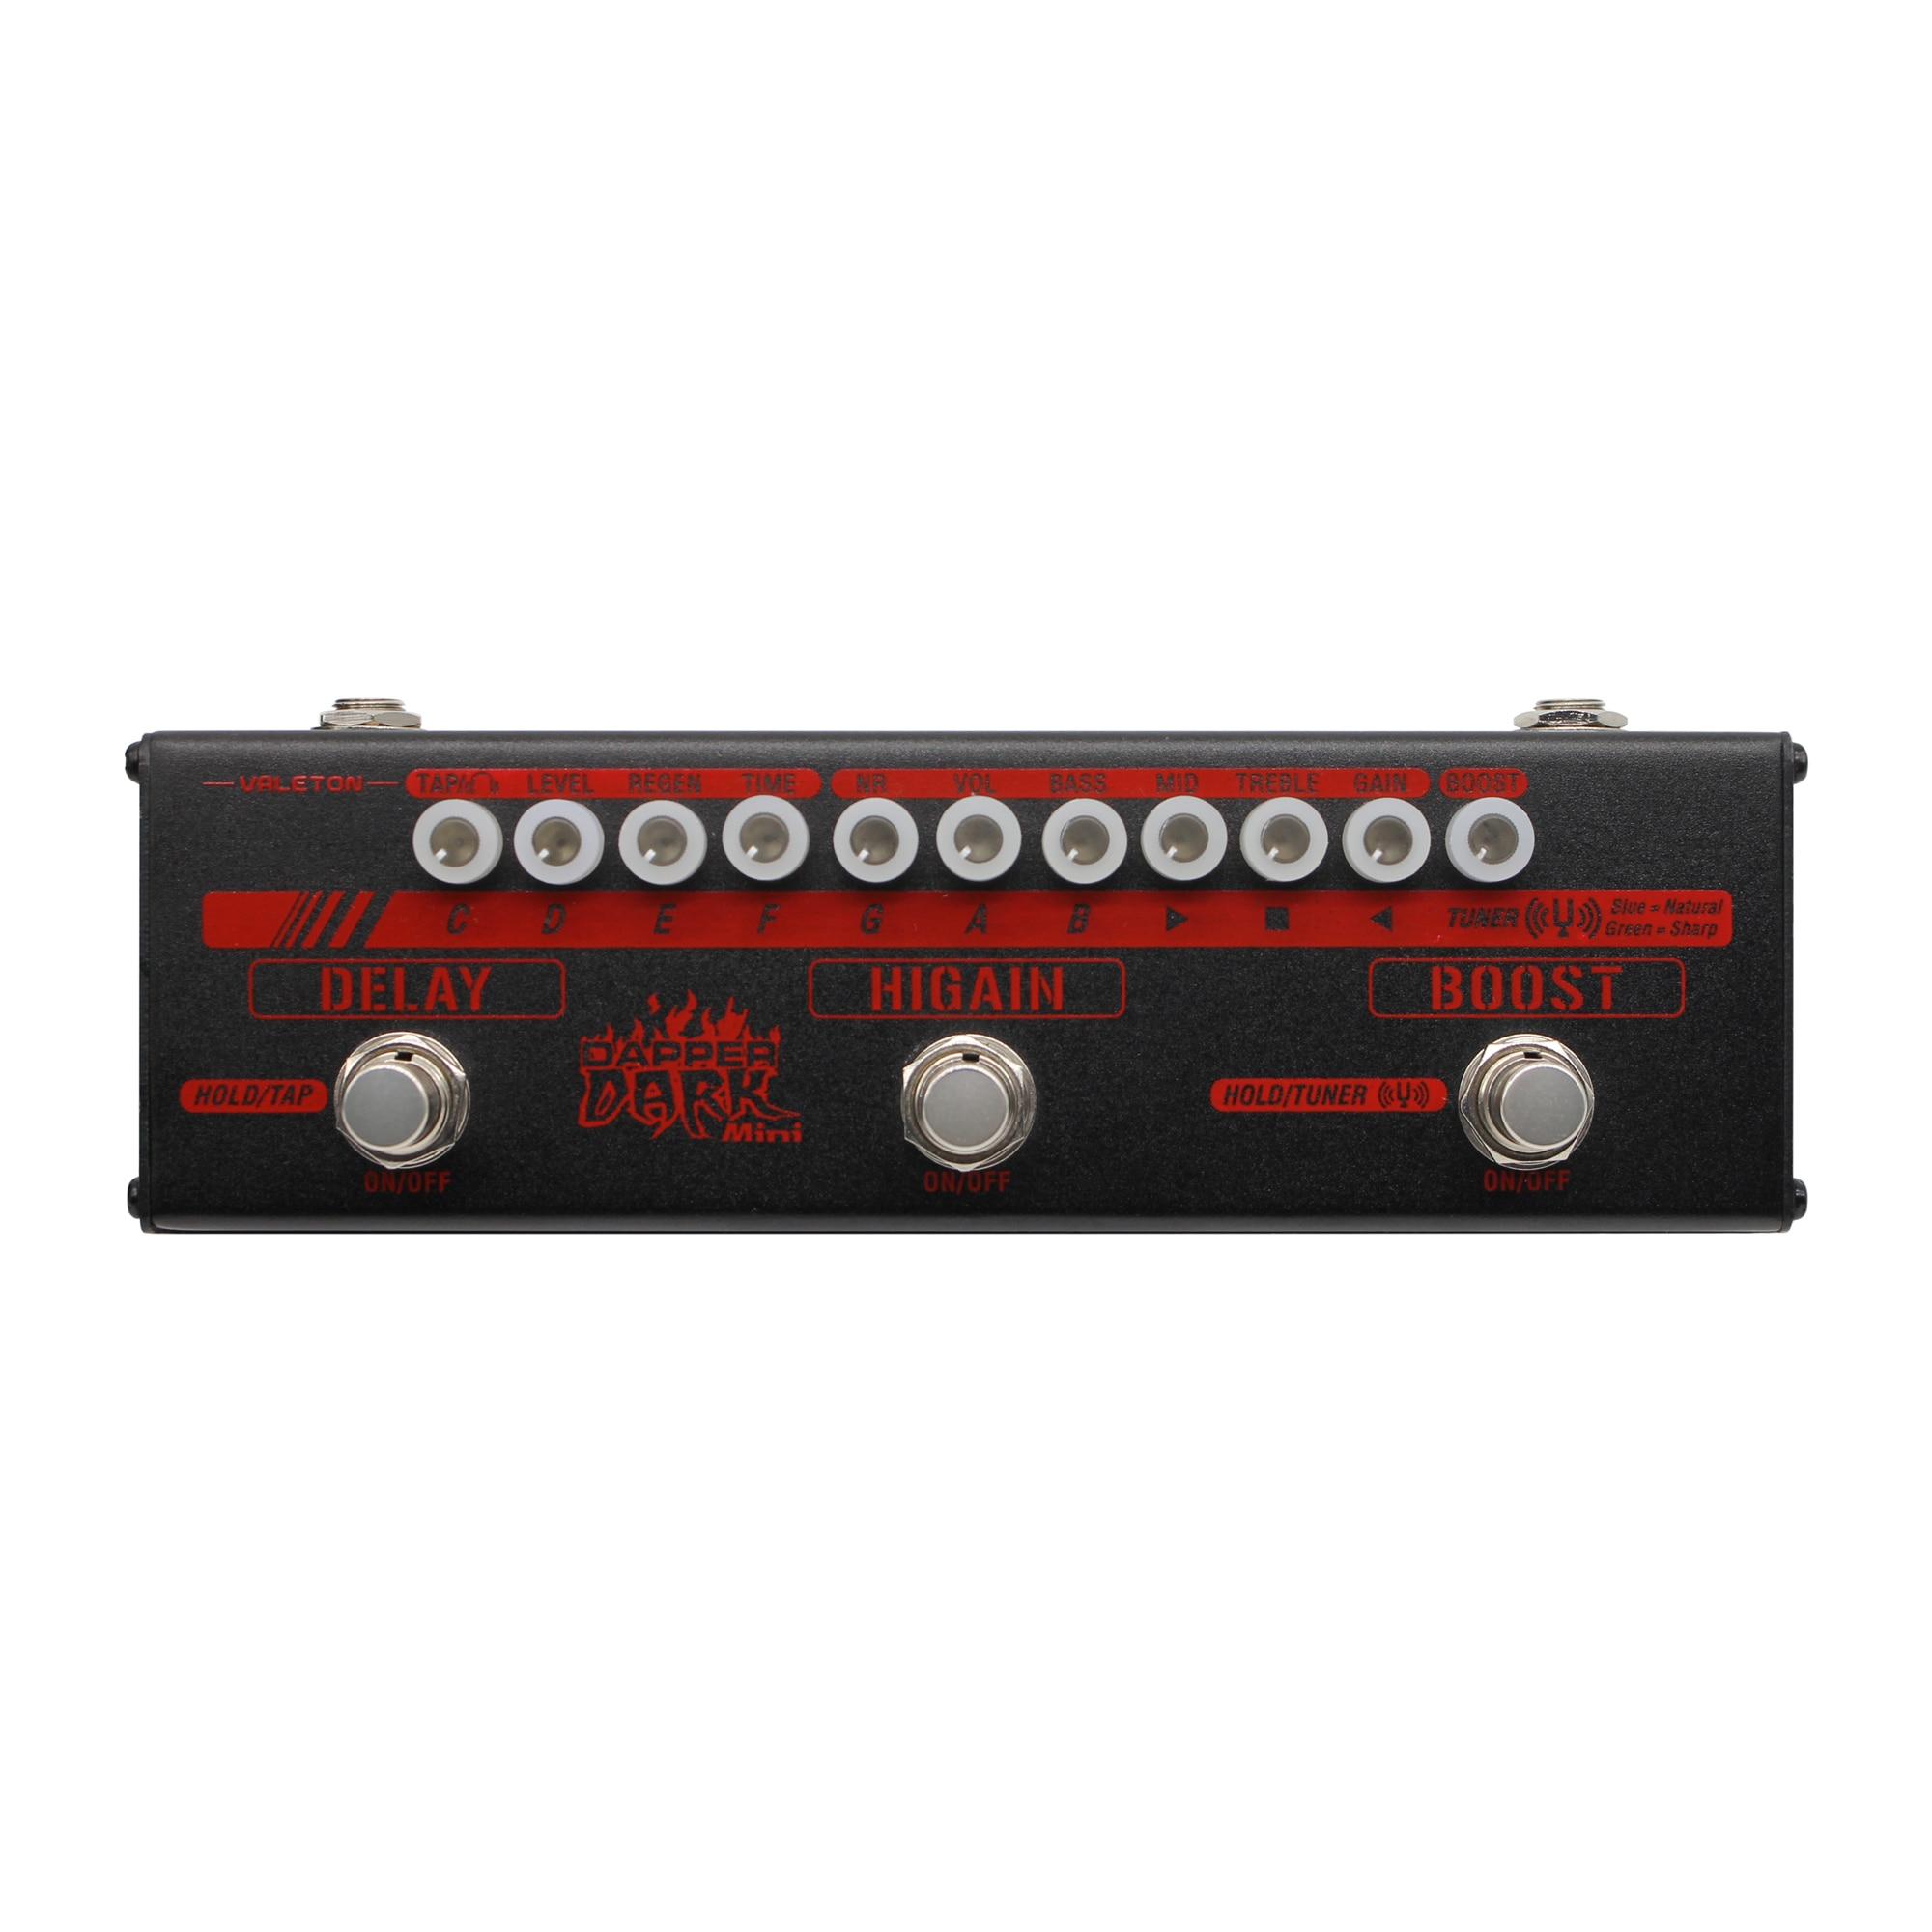 valeton dapper dark mini mes 3 electric guitar pedals high gain delay boost effects strip multi. Black Bedroom Furniture Sets. Home Design Ideas